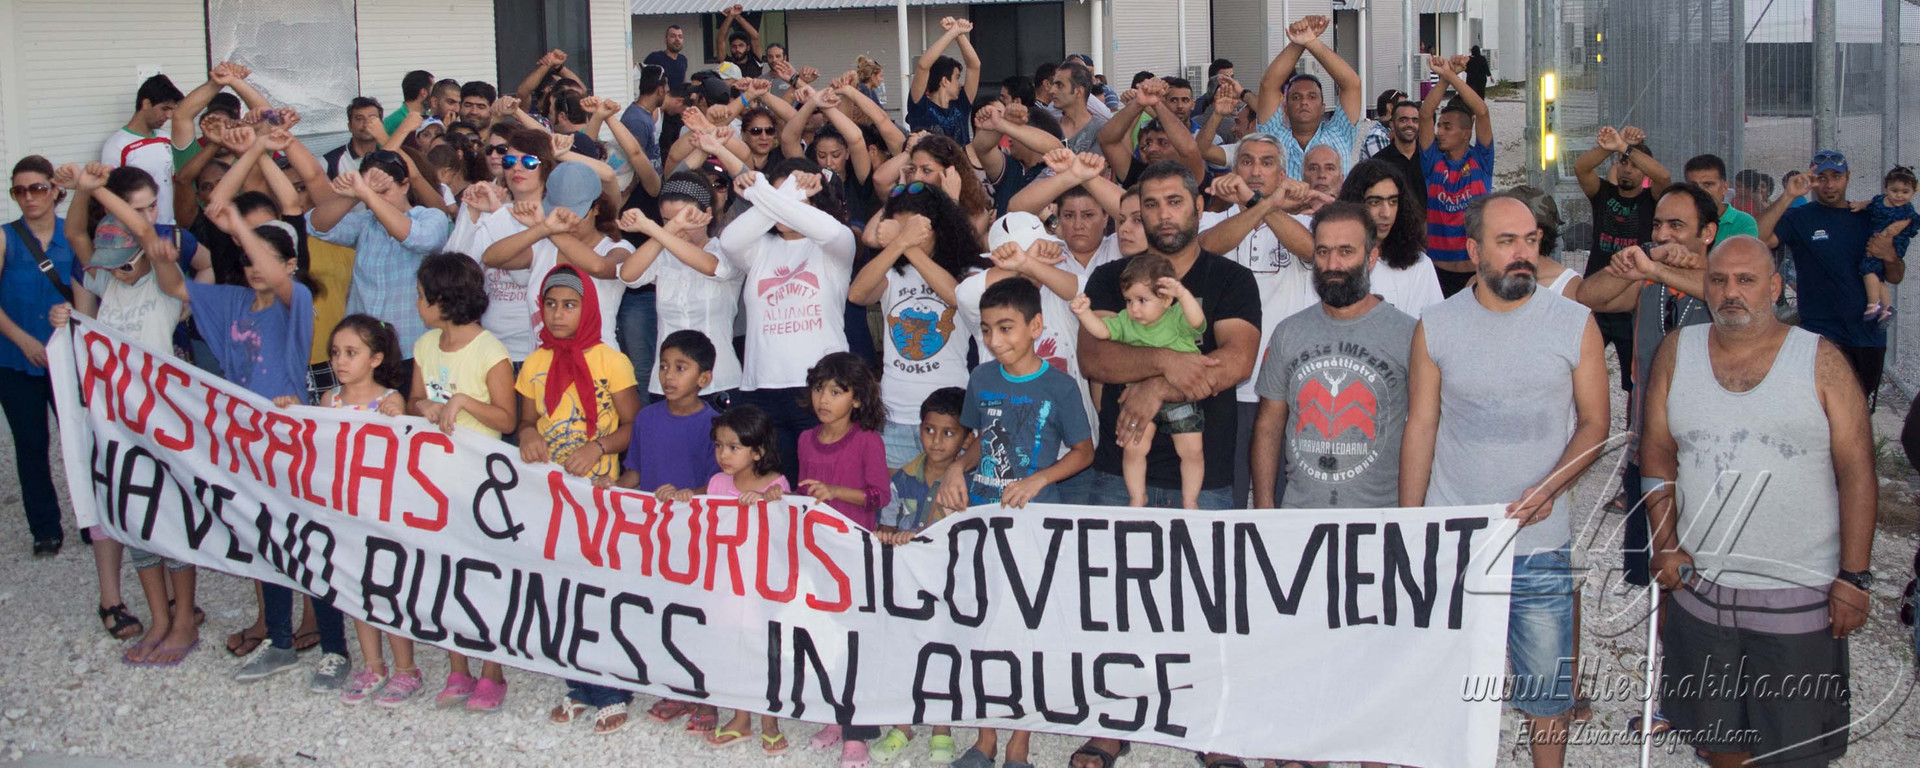 Protest-07.jpg